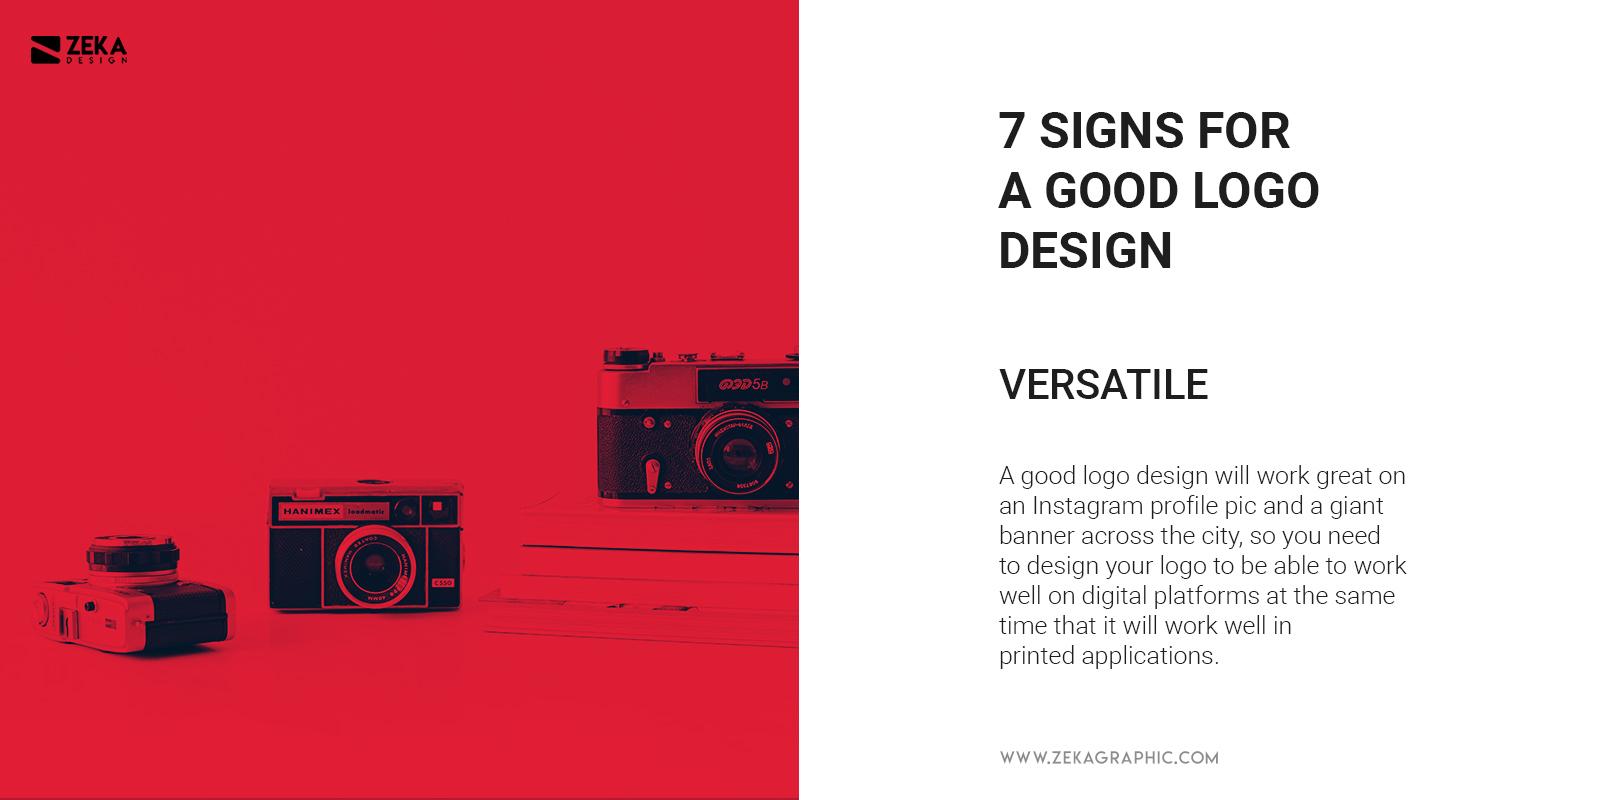 Versatile Logo Design Quality What Makes Good Logo Design